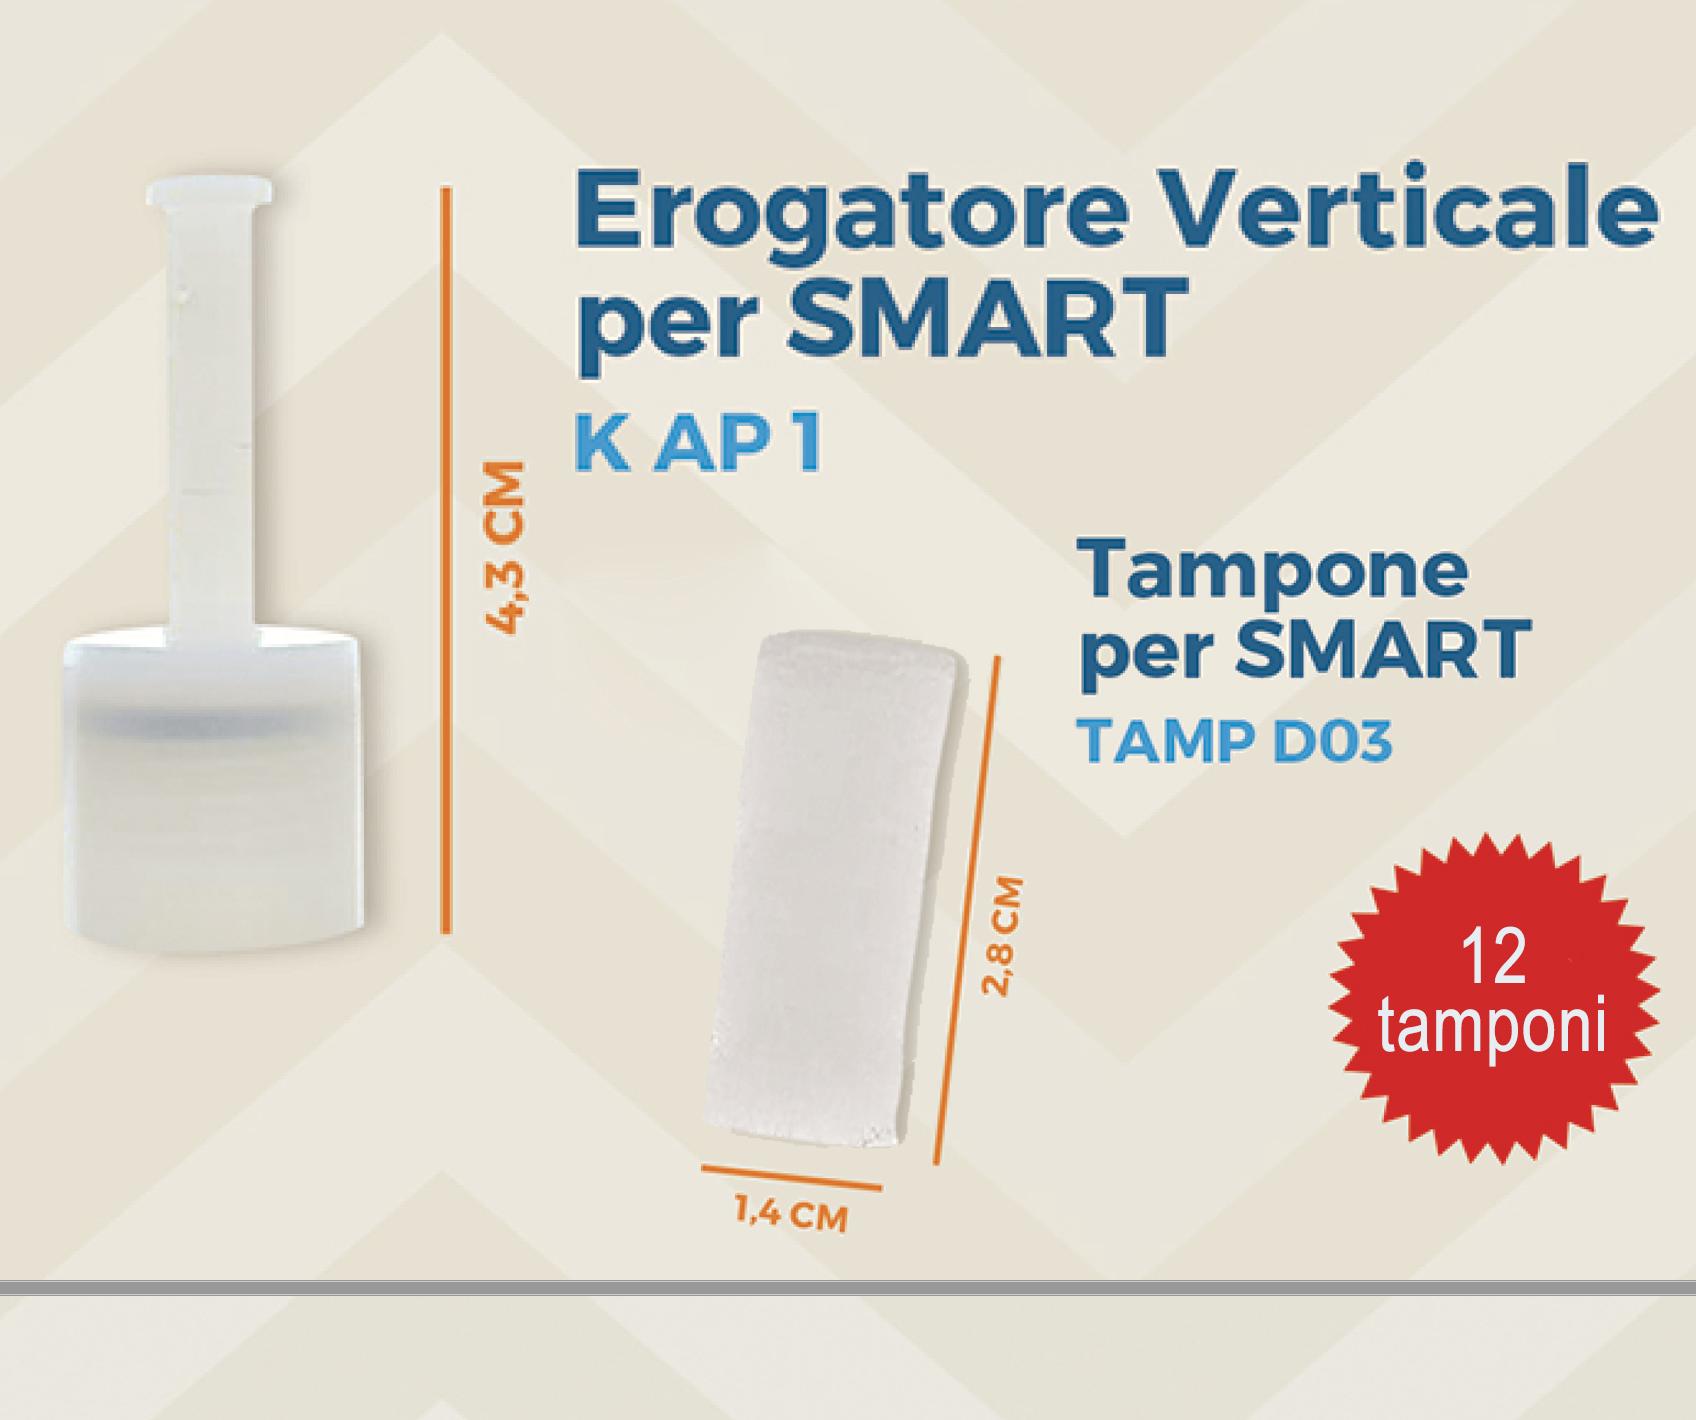 Brasotek - codice K AP1 + 4 x TAMP D03 - Kit ricambi composto da 1 erogatore verticale grande + 12 tamponi SMART (per flacone 20 ml)